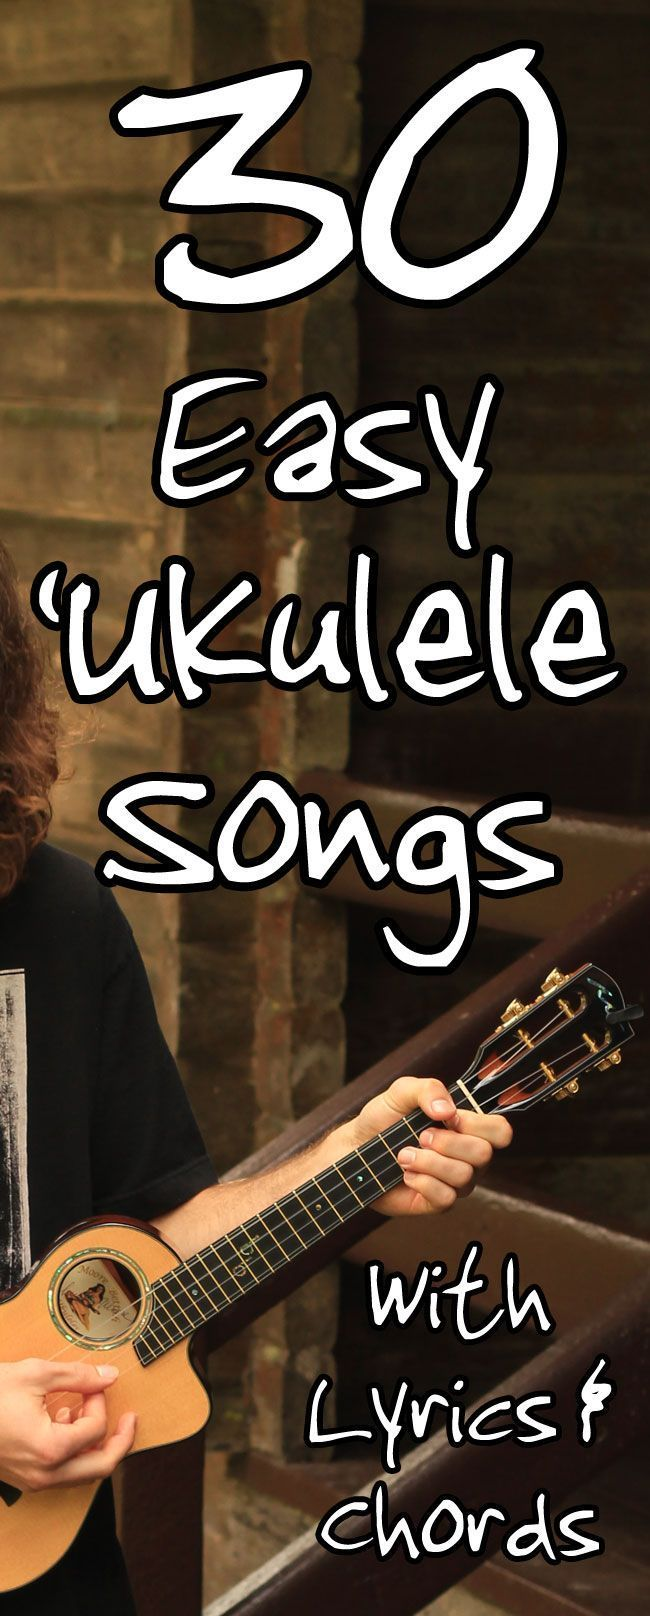 30 Easy Ukulele Songs For Beginners 3 Or 4 Chord Songs With Lyrics